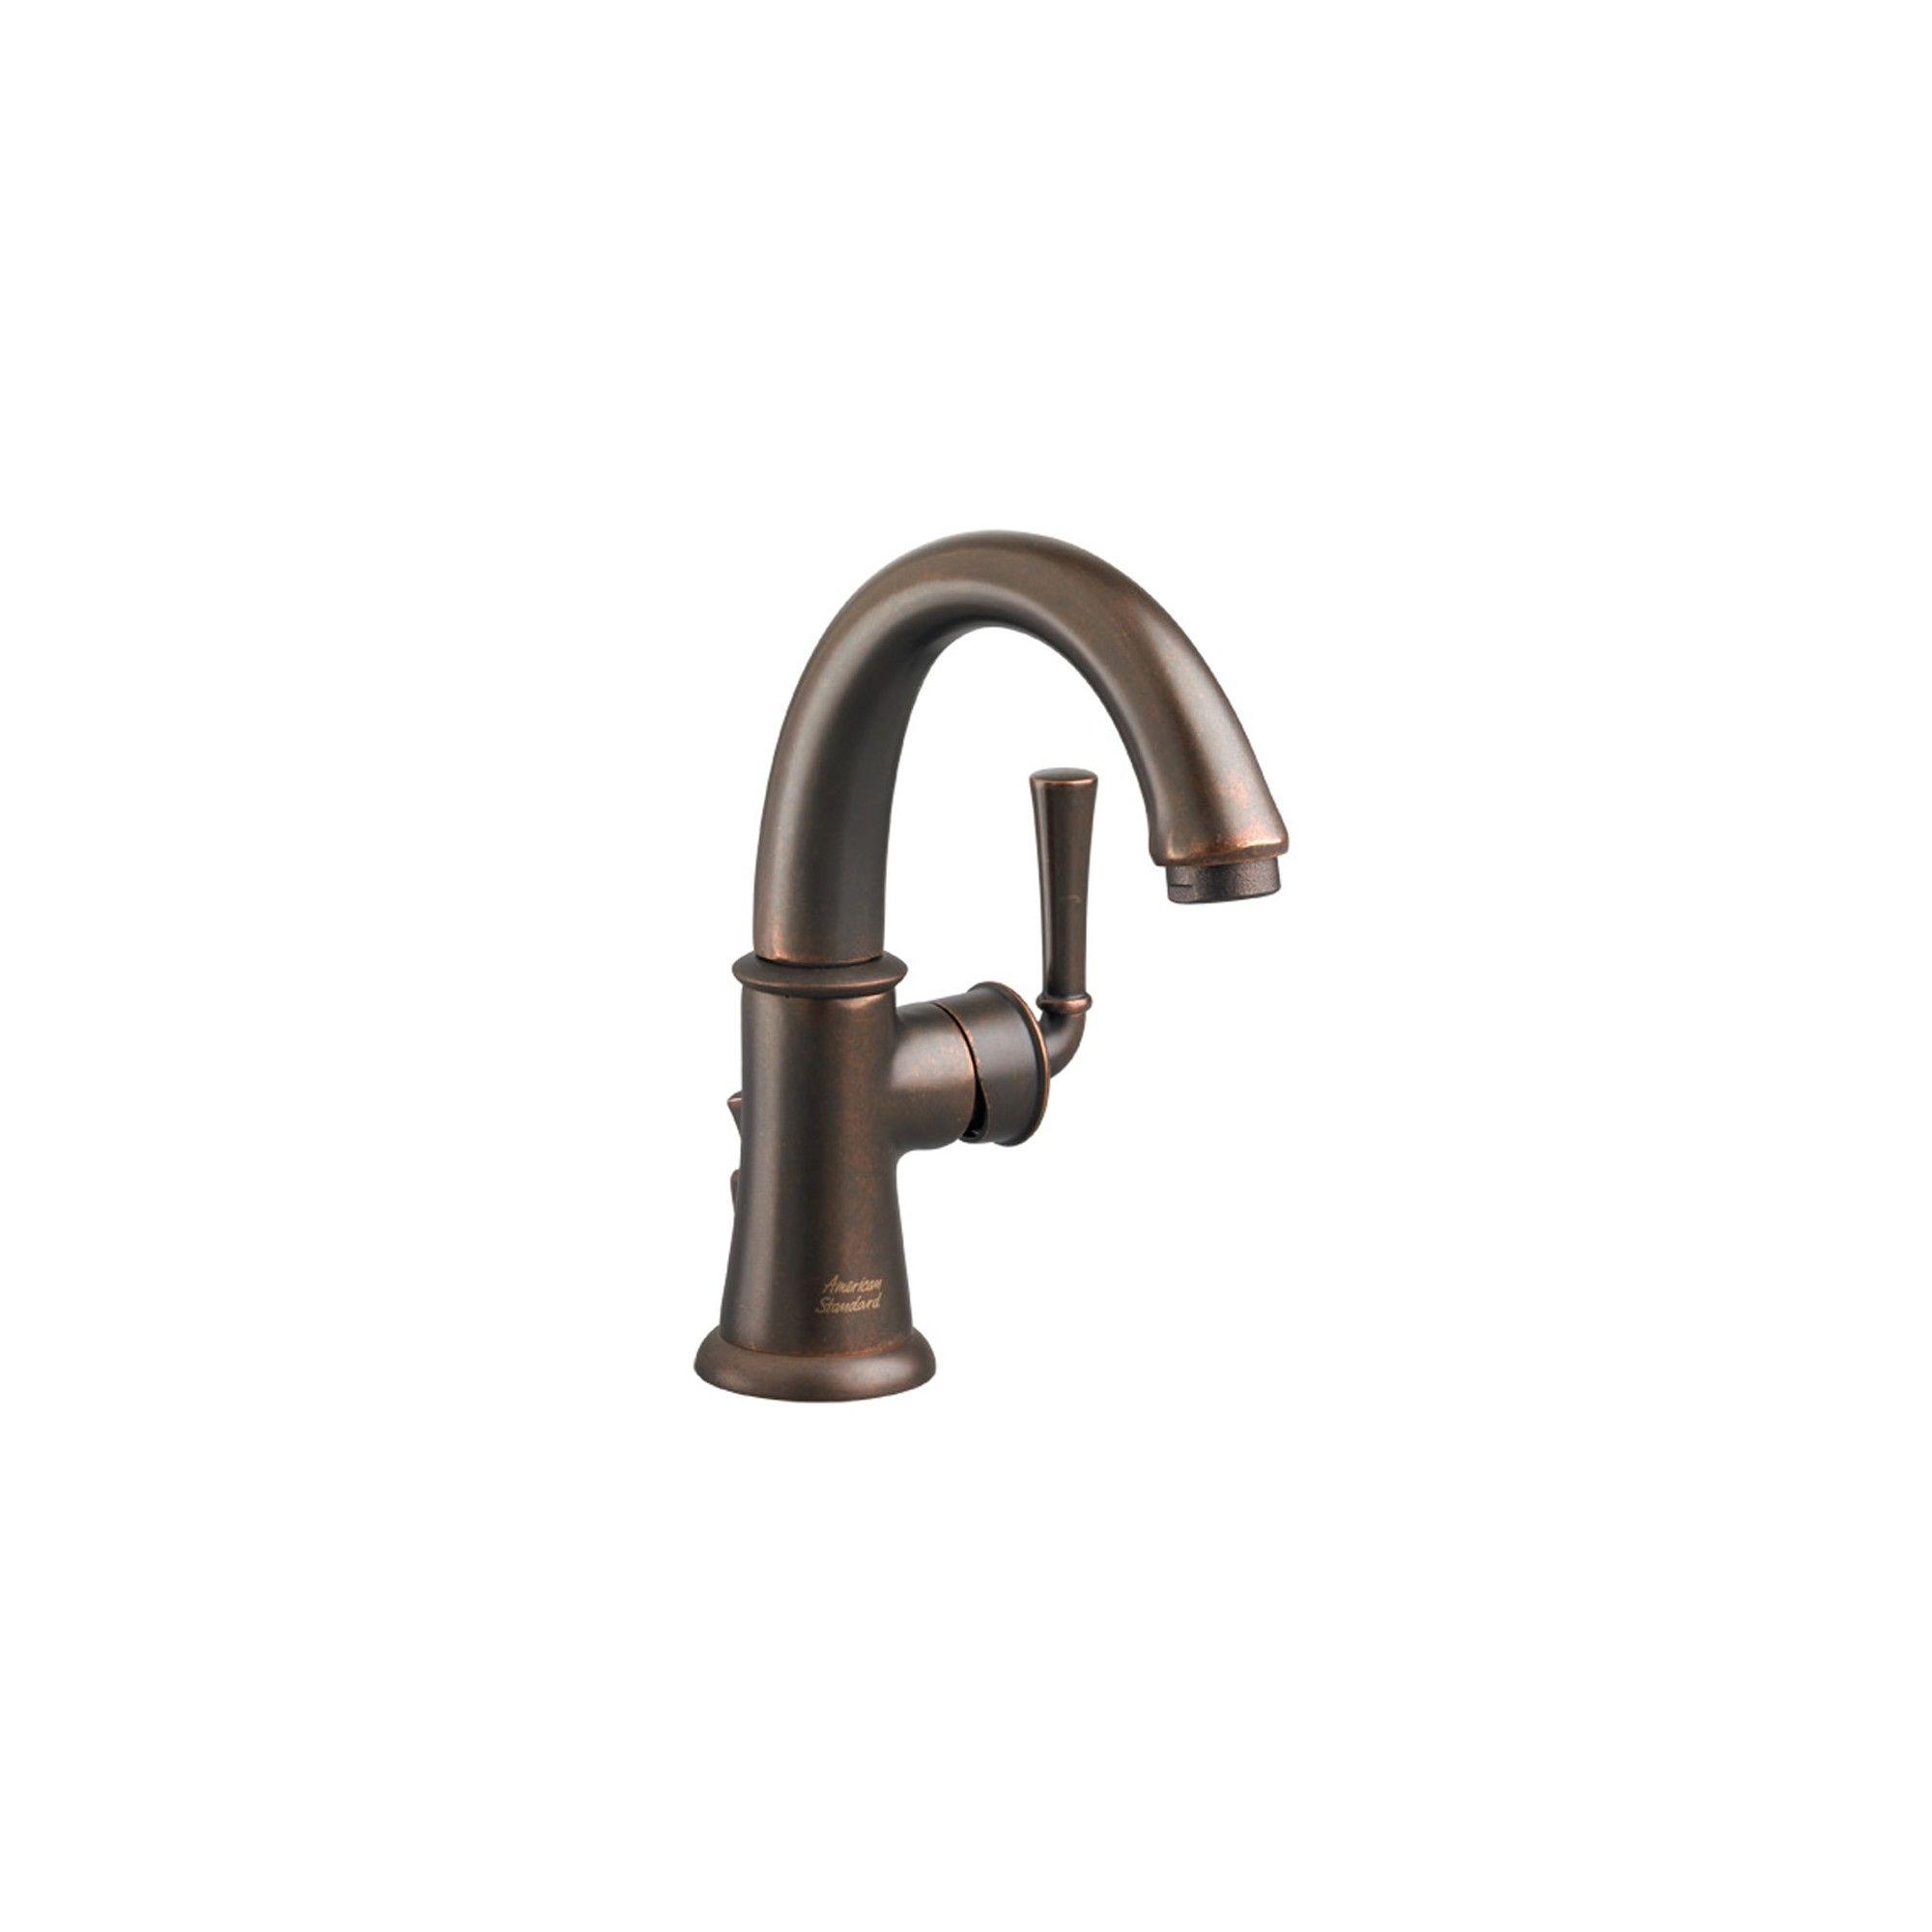 American Standard 7420 101 Portsmouth Single Hole Bathroom Faucet